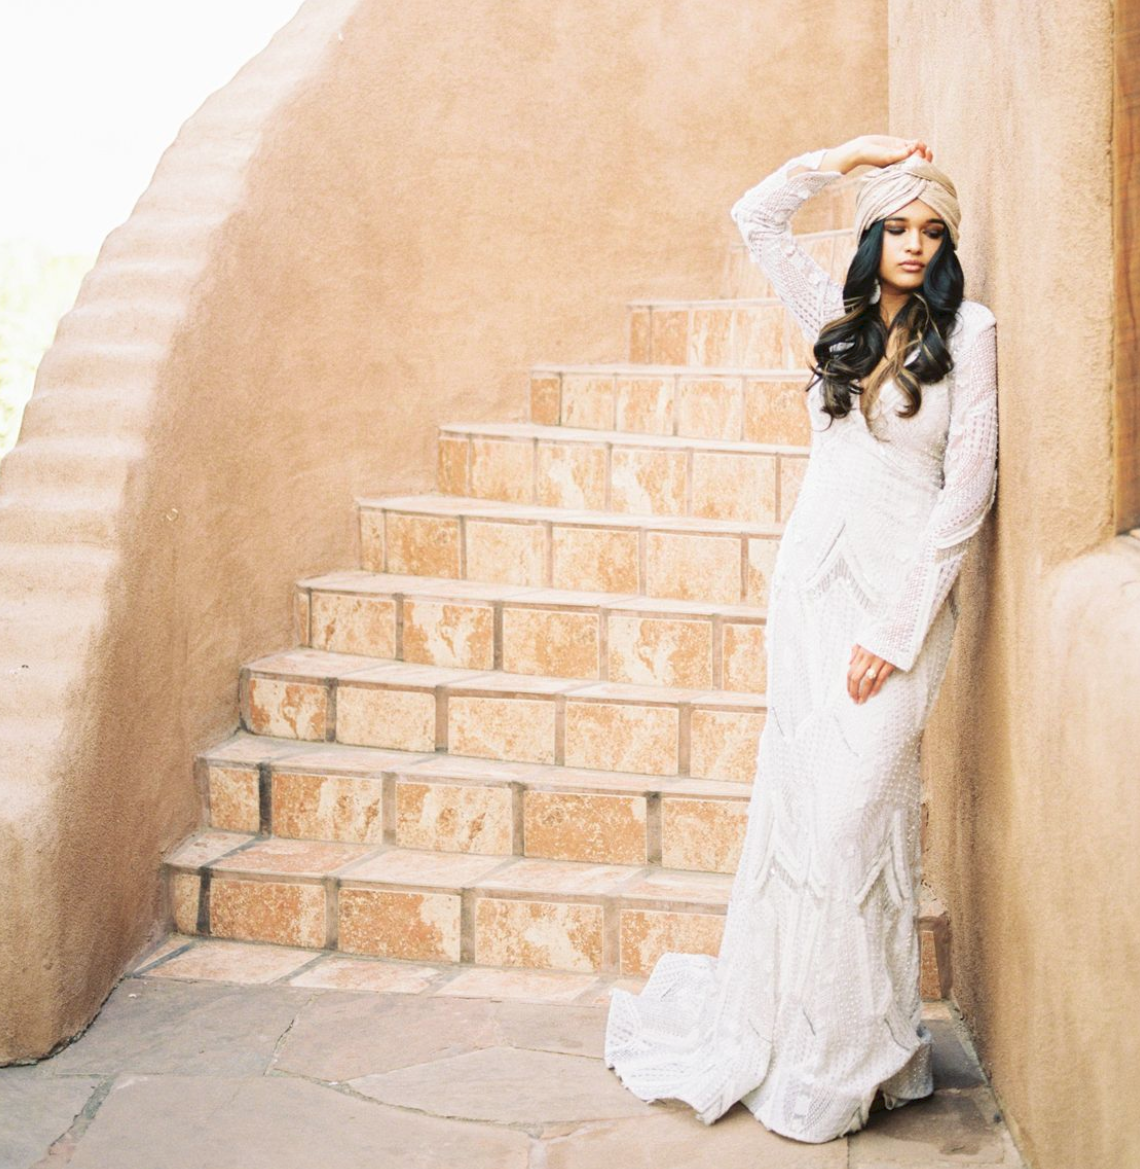 Santa Fe Desert Bride - As if the desert wasn't magical and mysterious already...